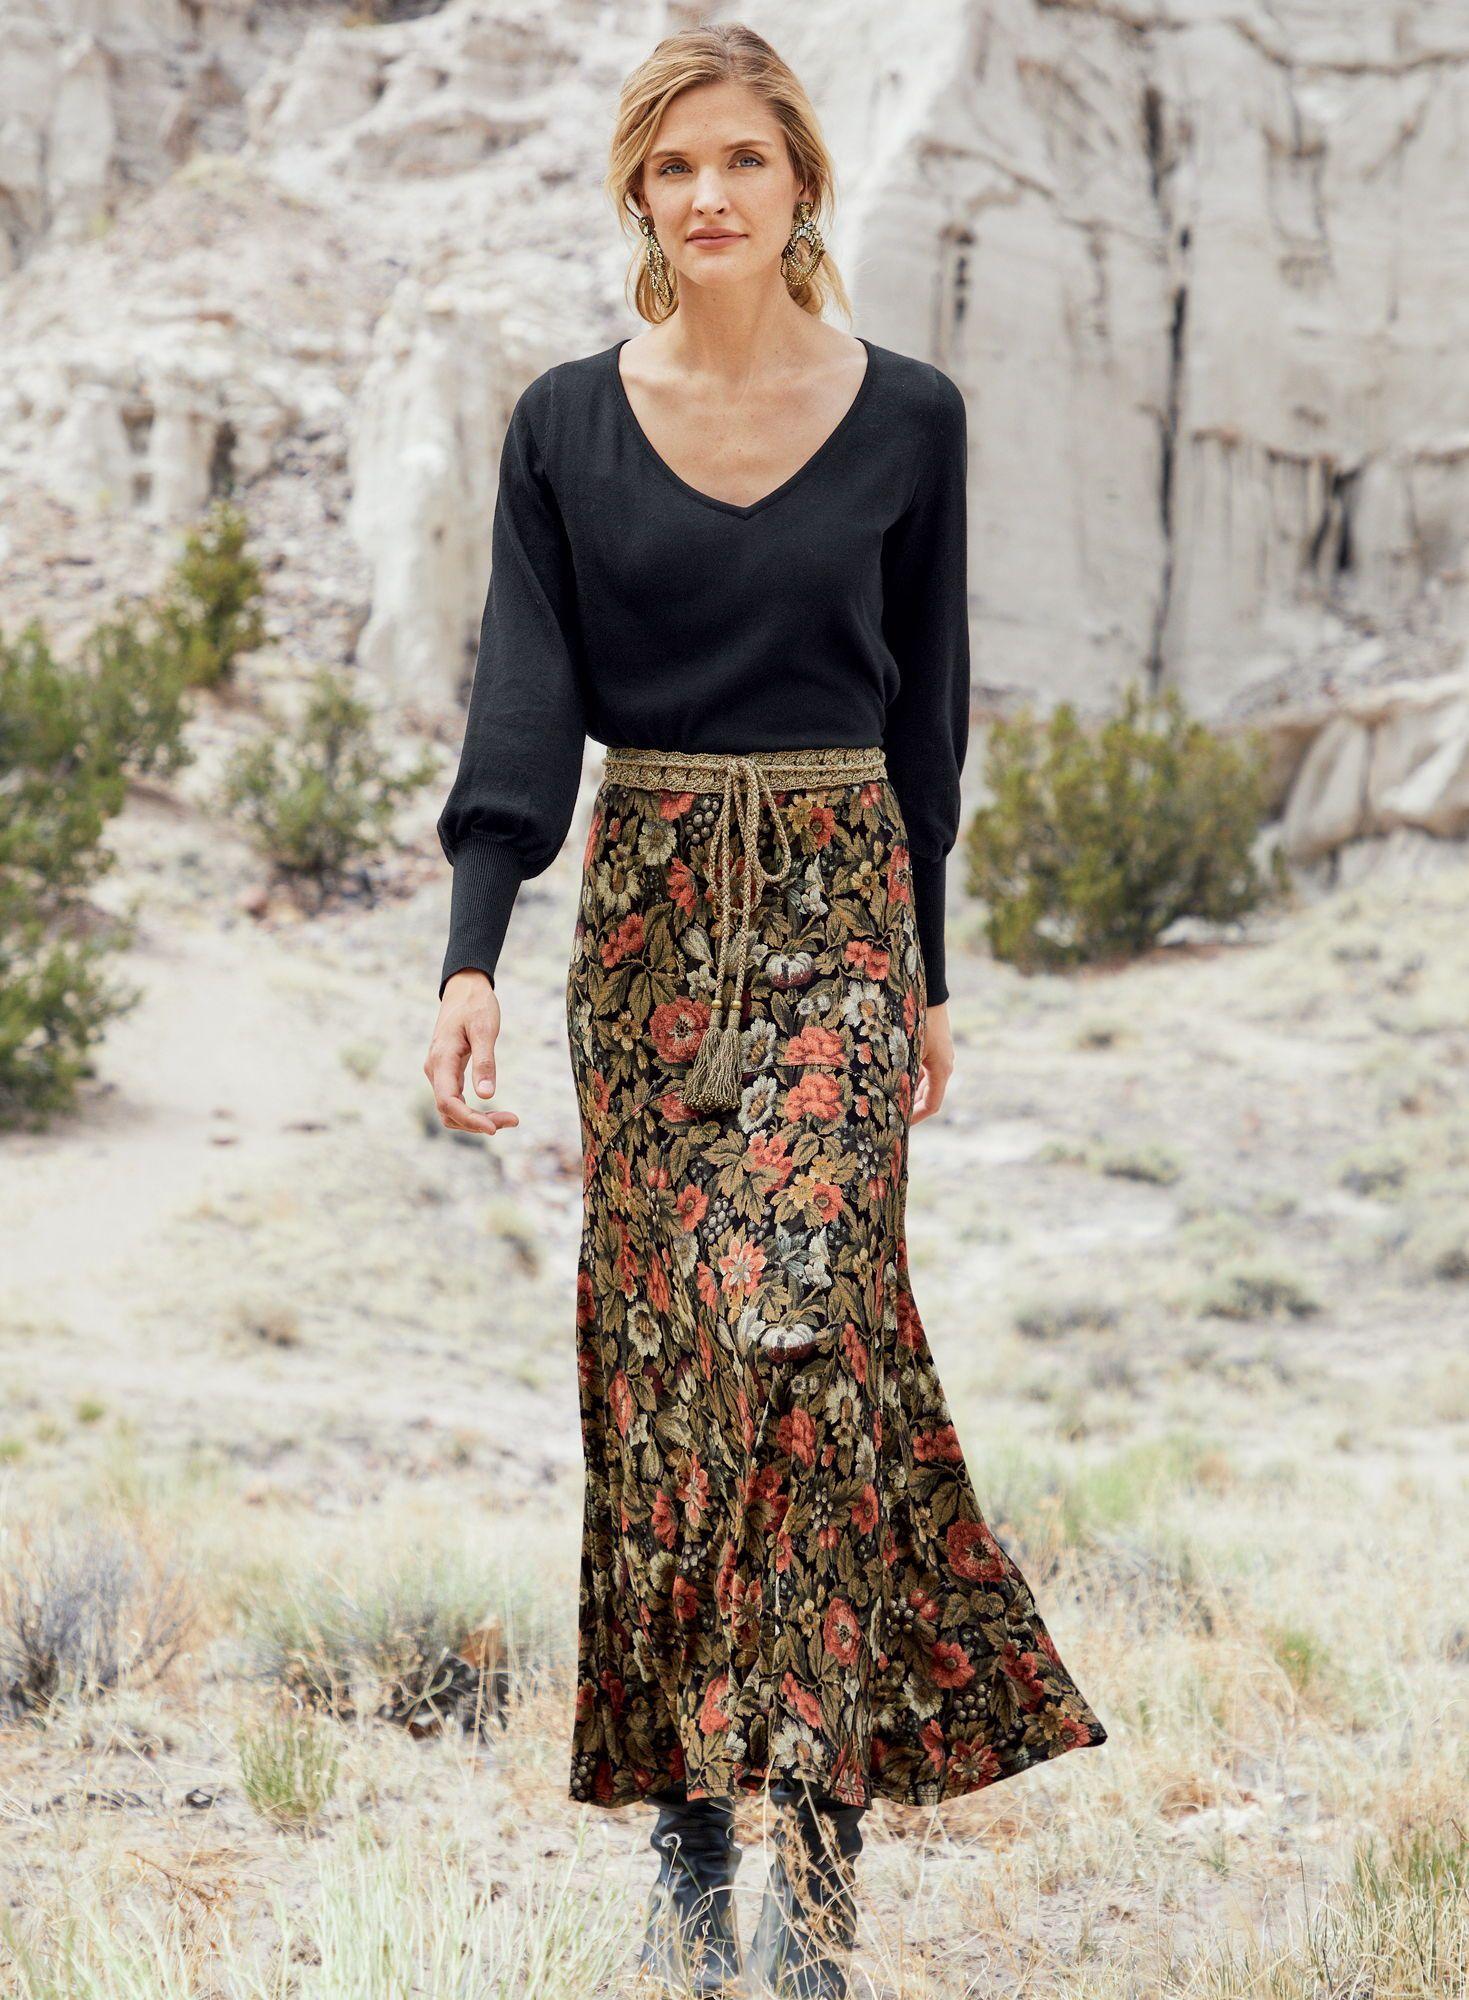 Wallpaper Maxi Skirt   Peruvian Connection   Boho skirt outfit ...